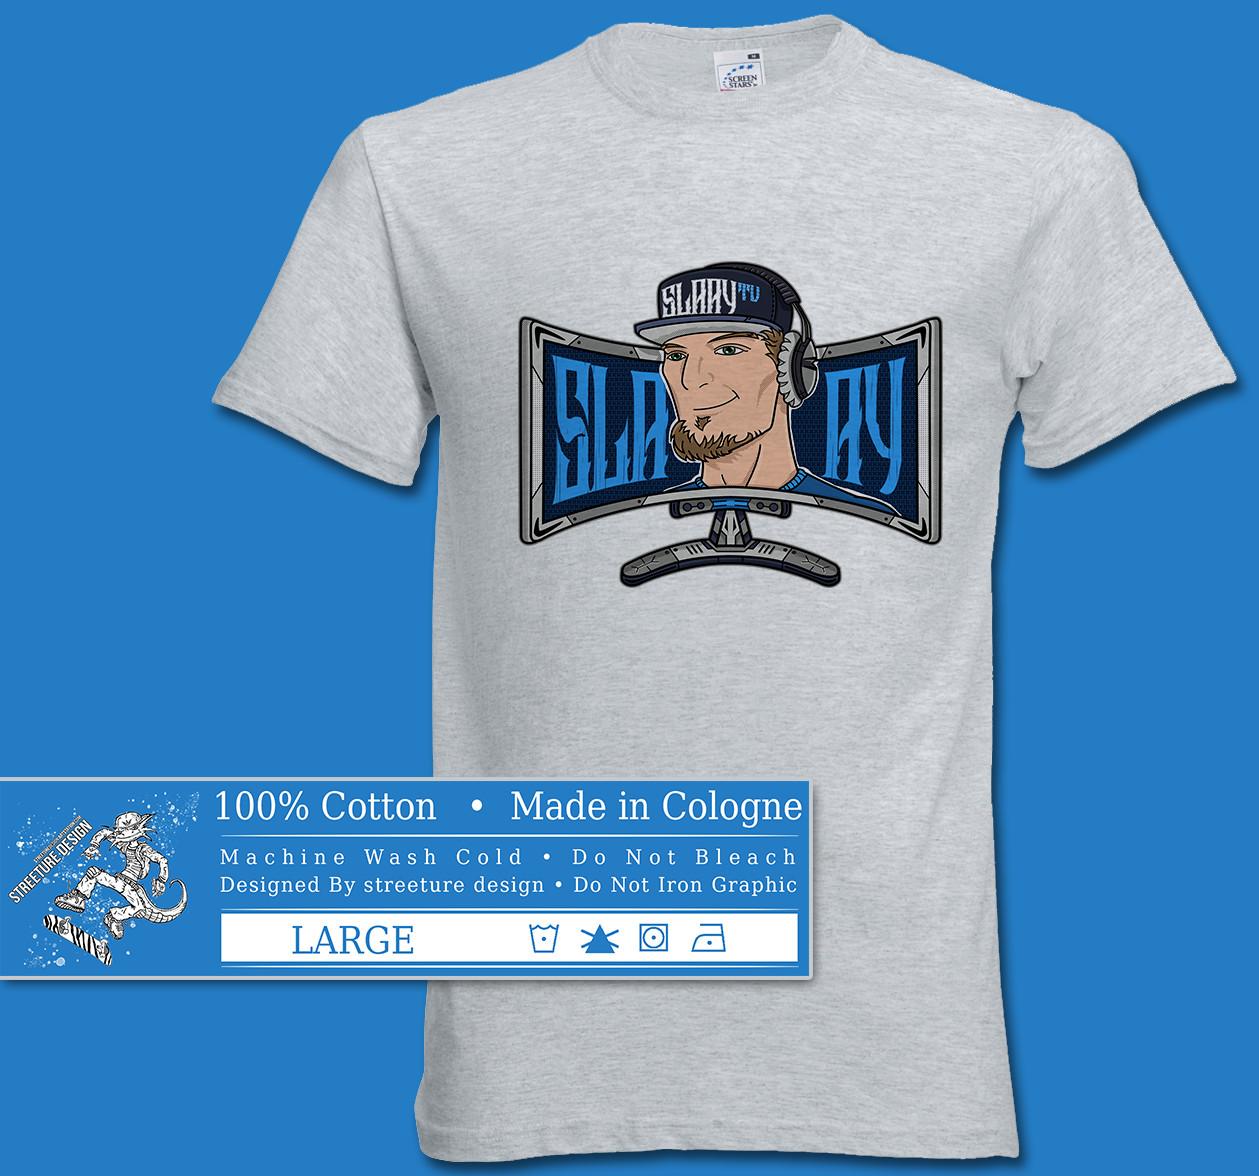 Streeture design bonus shirt